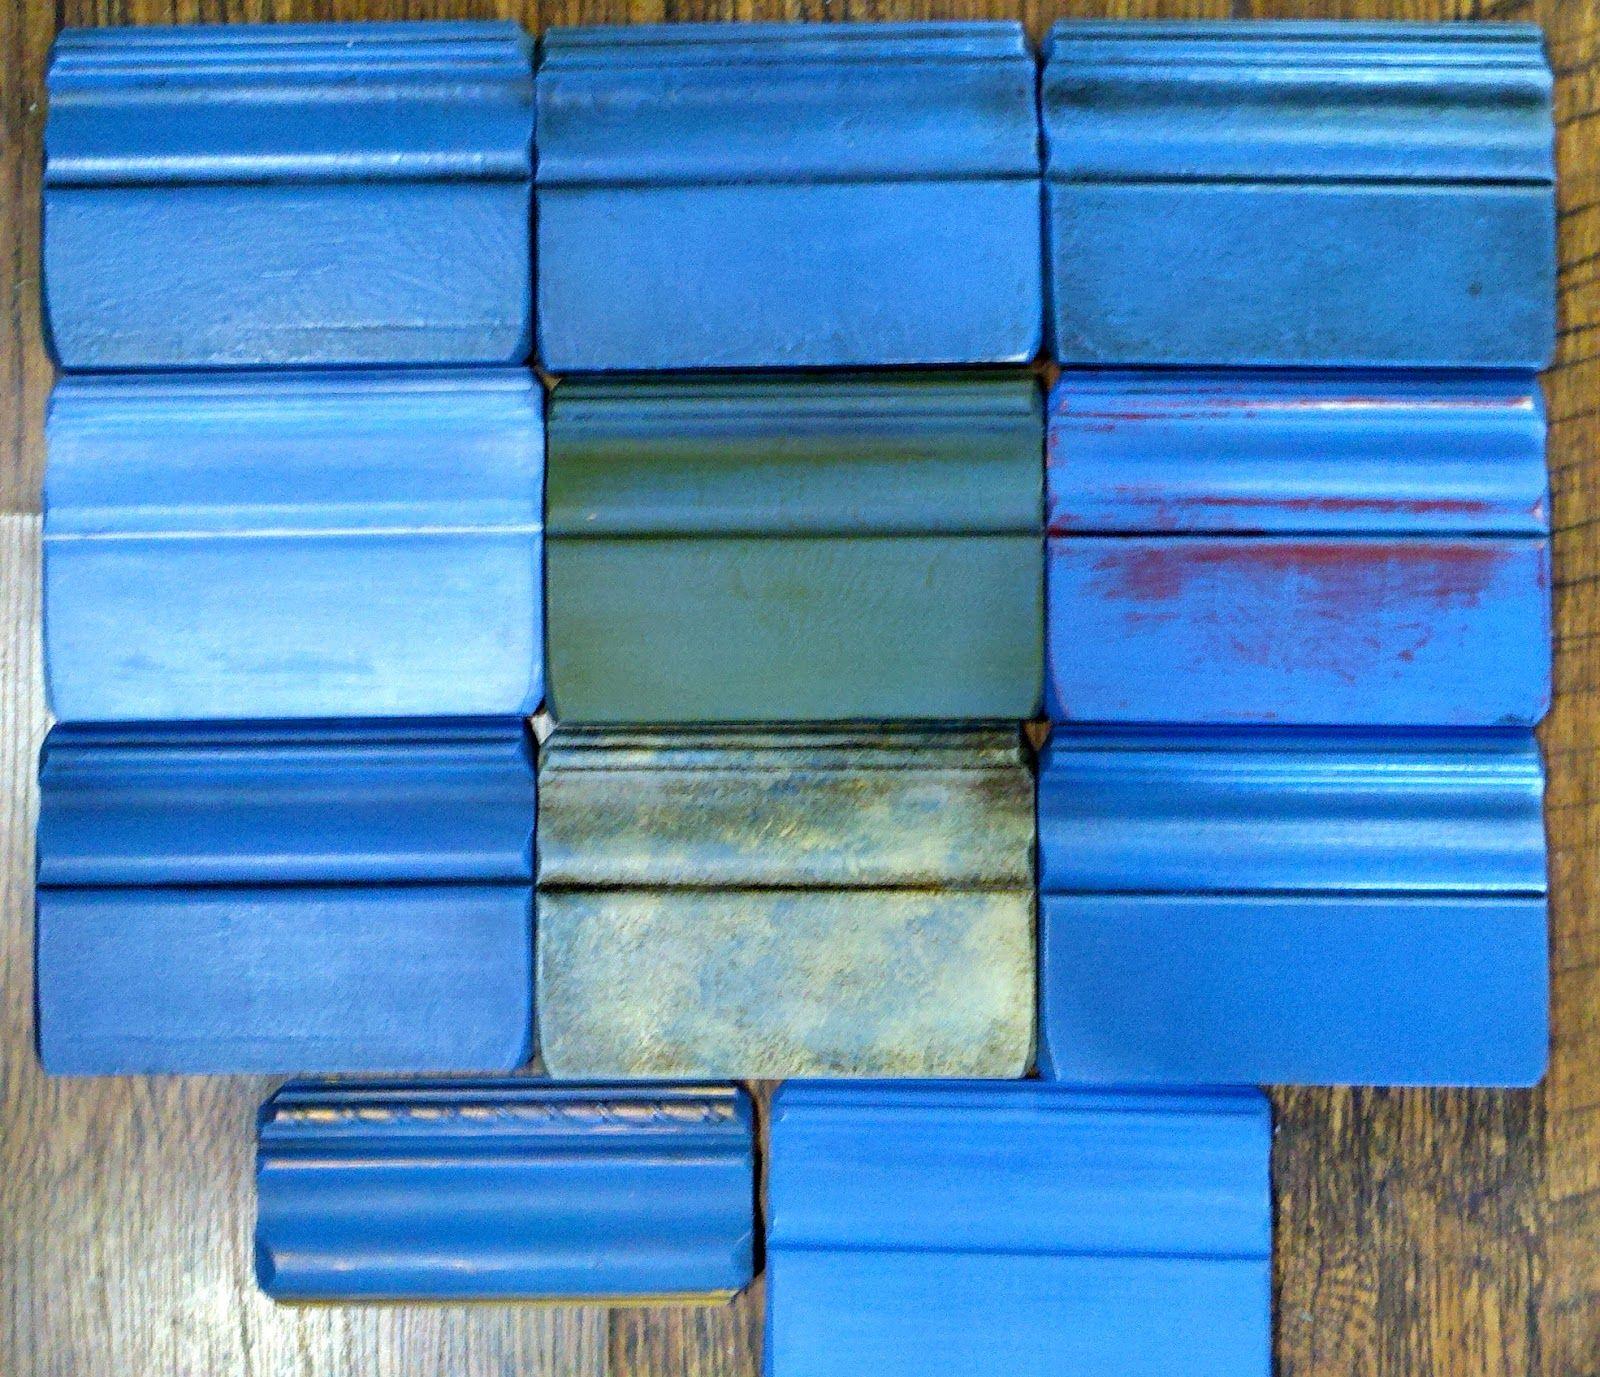 Blue paint samples - The Studio At 3 Oaks A Creative Journey Annie Sloan Greek Blue Samples